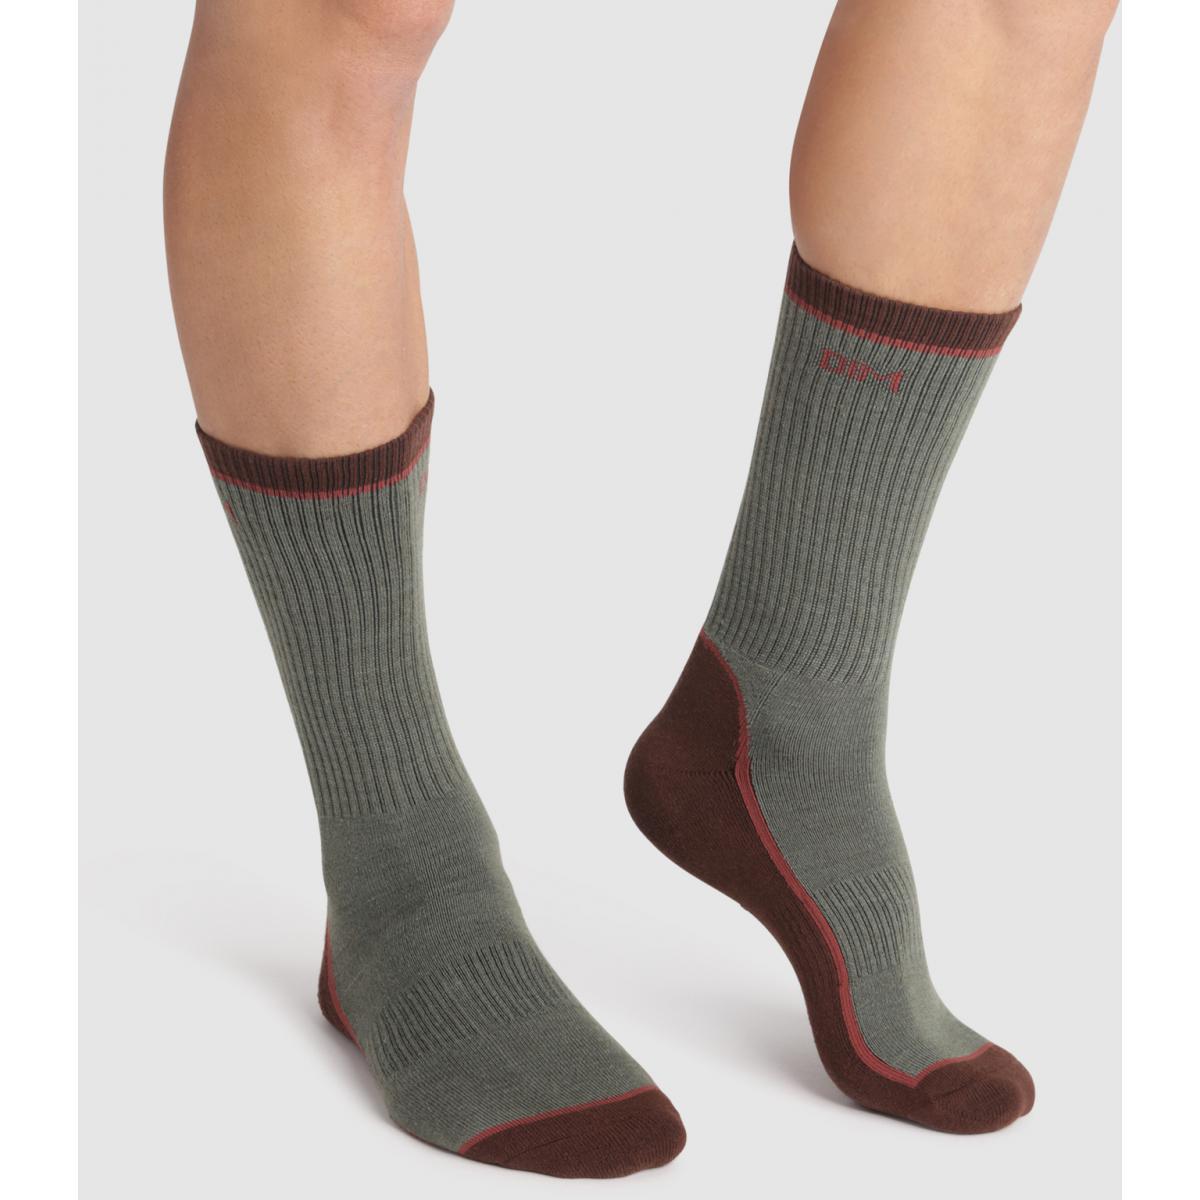 Chaussettes hautes outdoor - Vert - Dim Underwear - Modalova